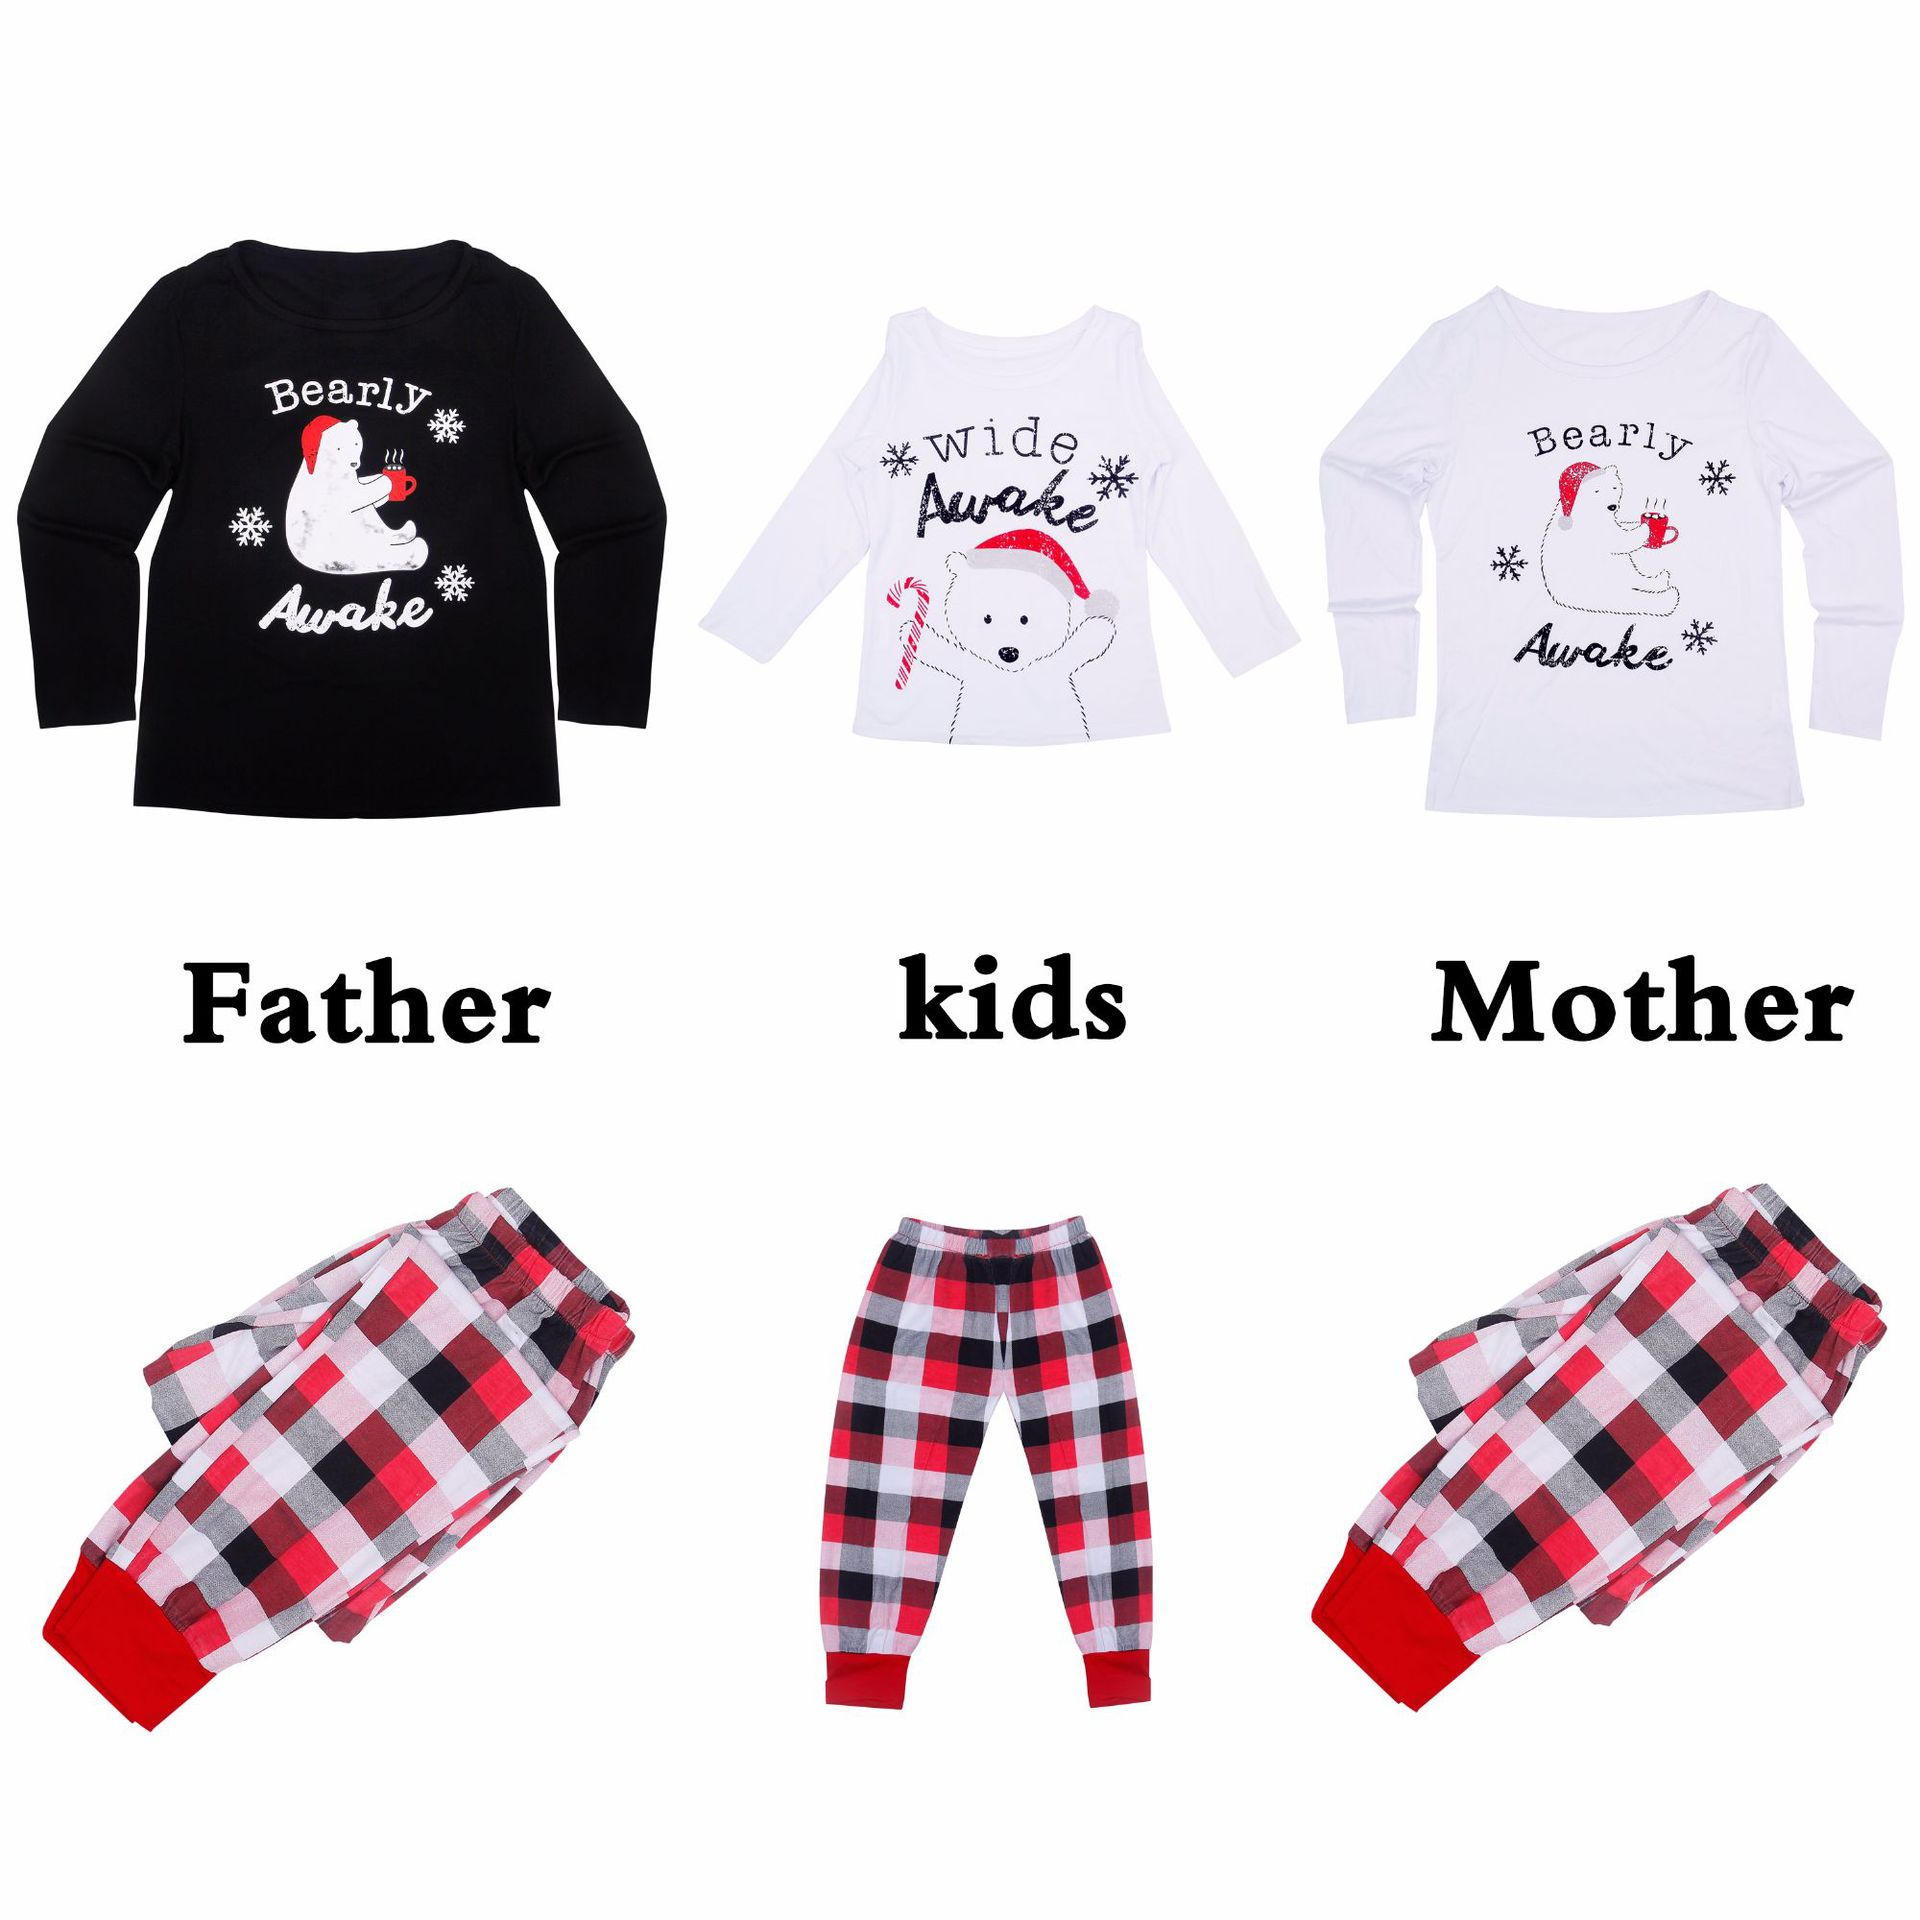 New 2018 Christmas Family Matching Outfits Pajamas Sleepwear Set ... c2aea2464